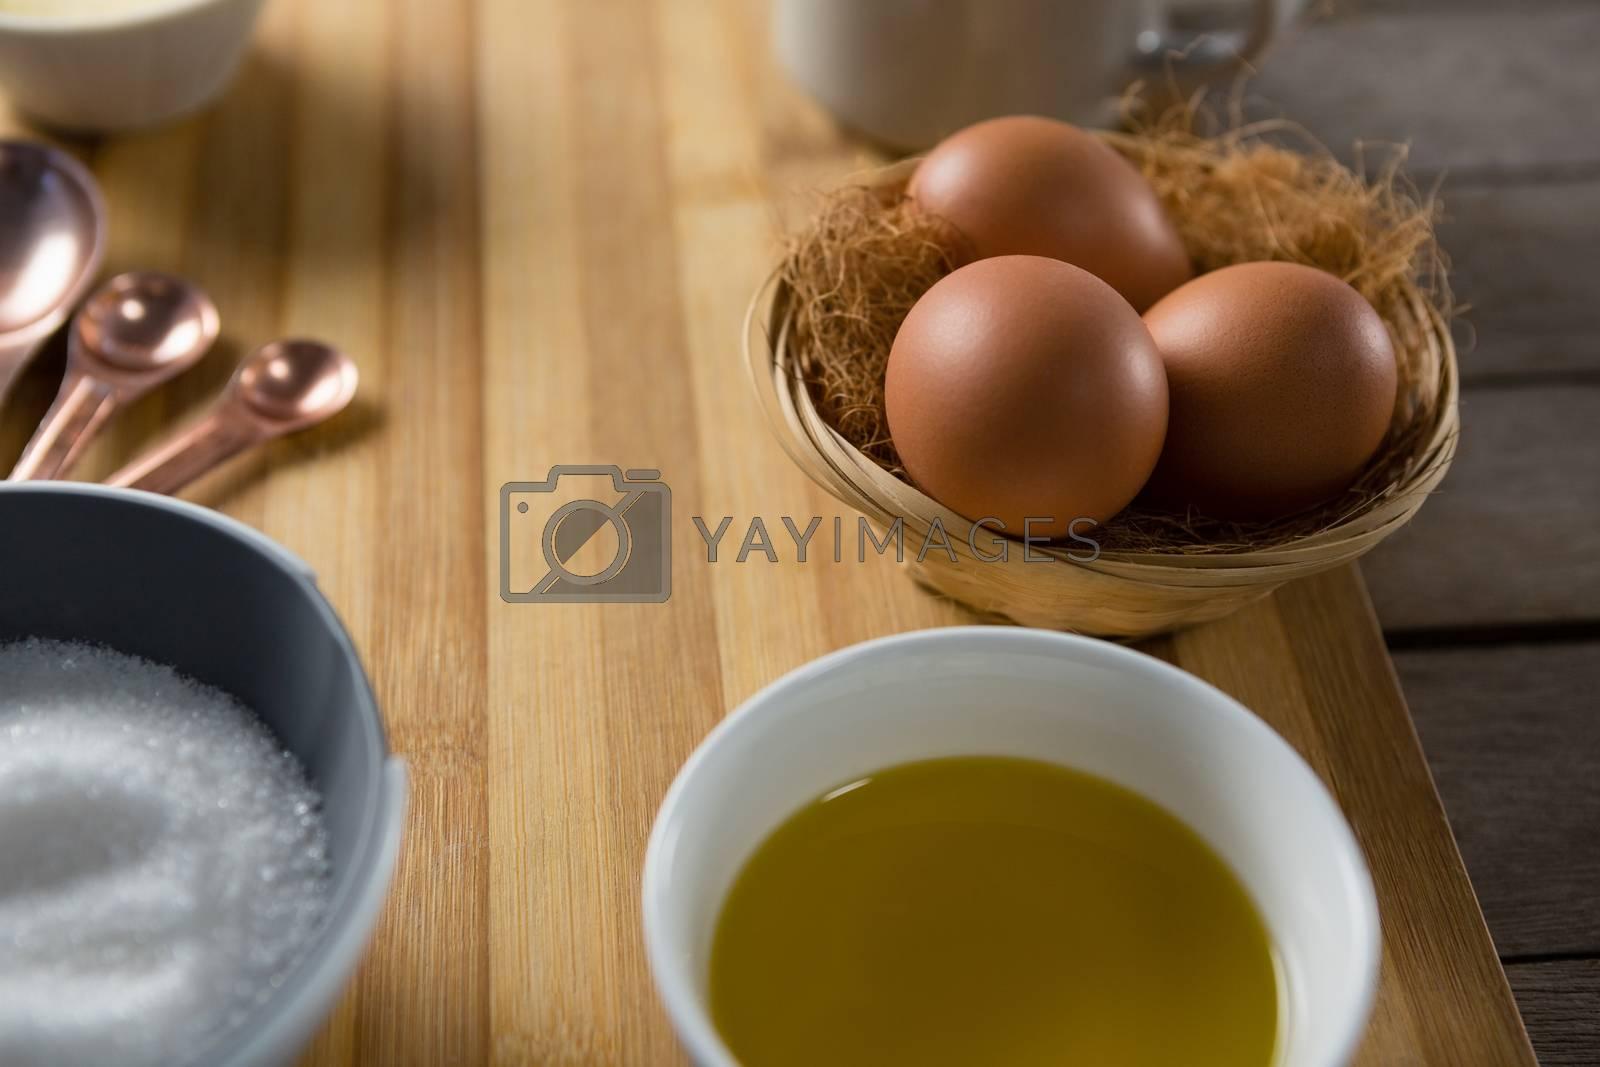 Eggs in wicker basket with oil, and sugar on wooden board by Wavebreakmedia